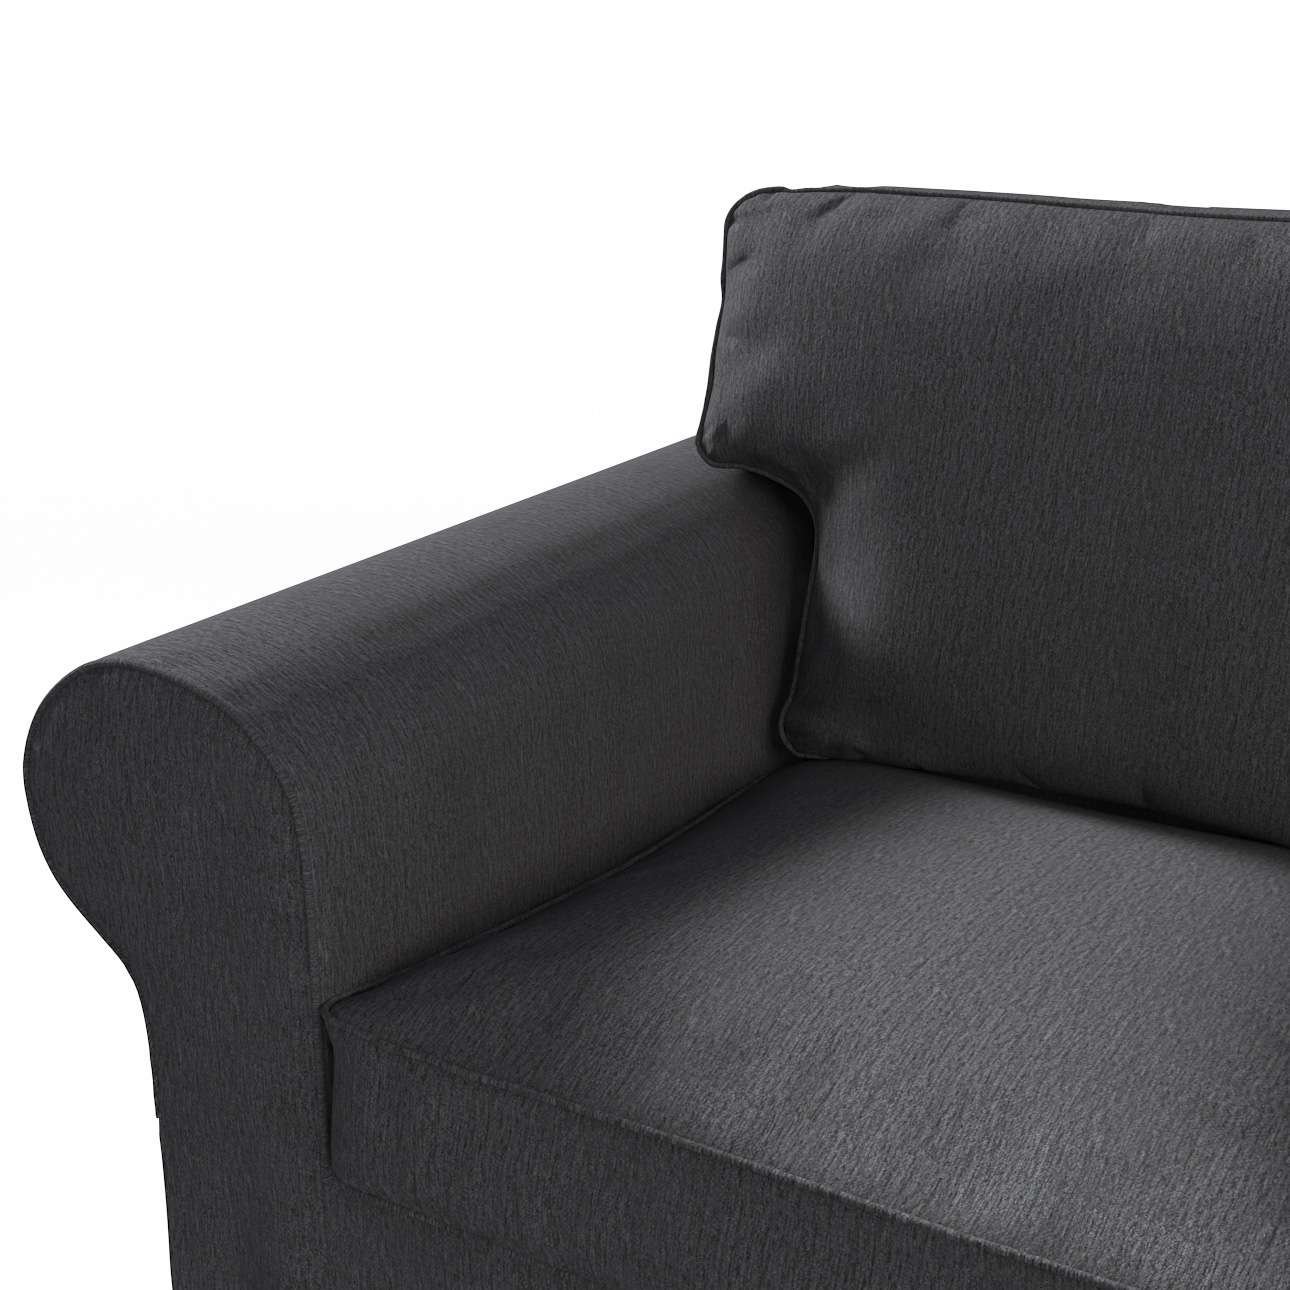 Ektorp 3-Sitzer Schlafsofabezug, ALTES Modell Sofahusse Ektorp 3-Sitzer Schlafsofa von der Kollektion Chenille , Stoff: 702-20